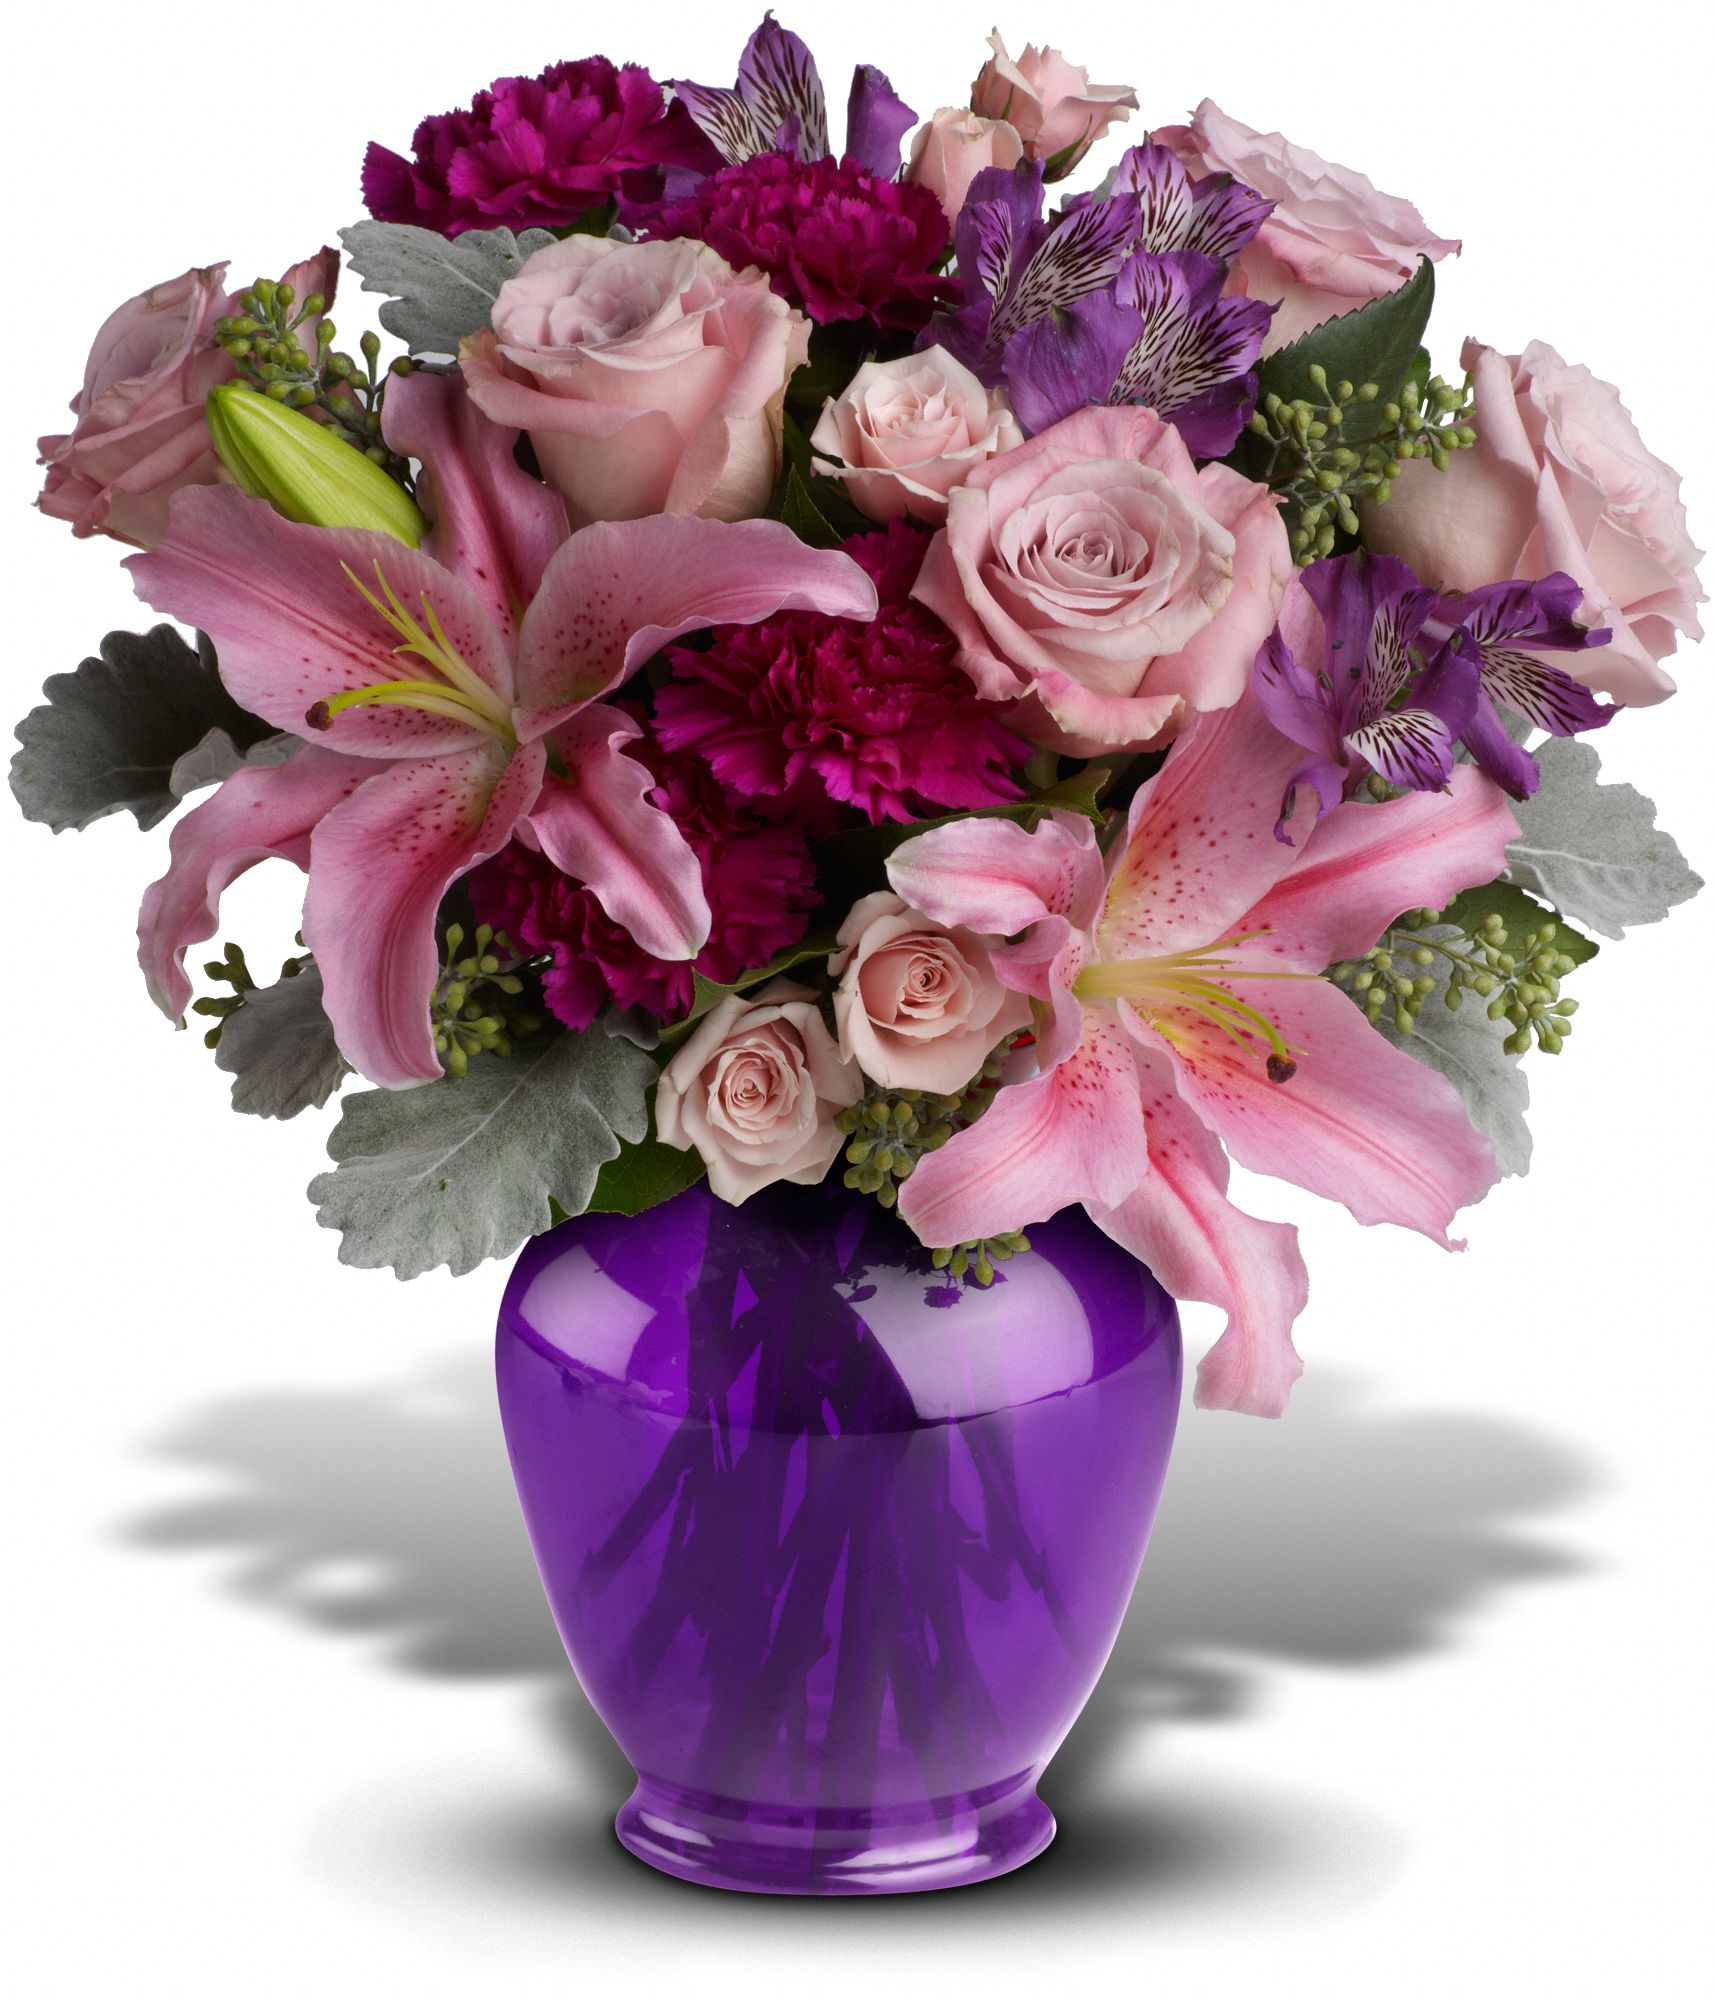 Teleflora's Elegant Beauty MIxed Floral Bouquet